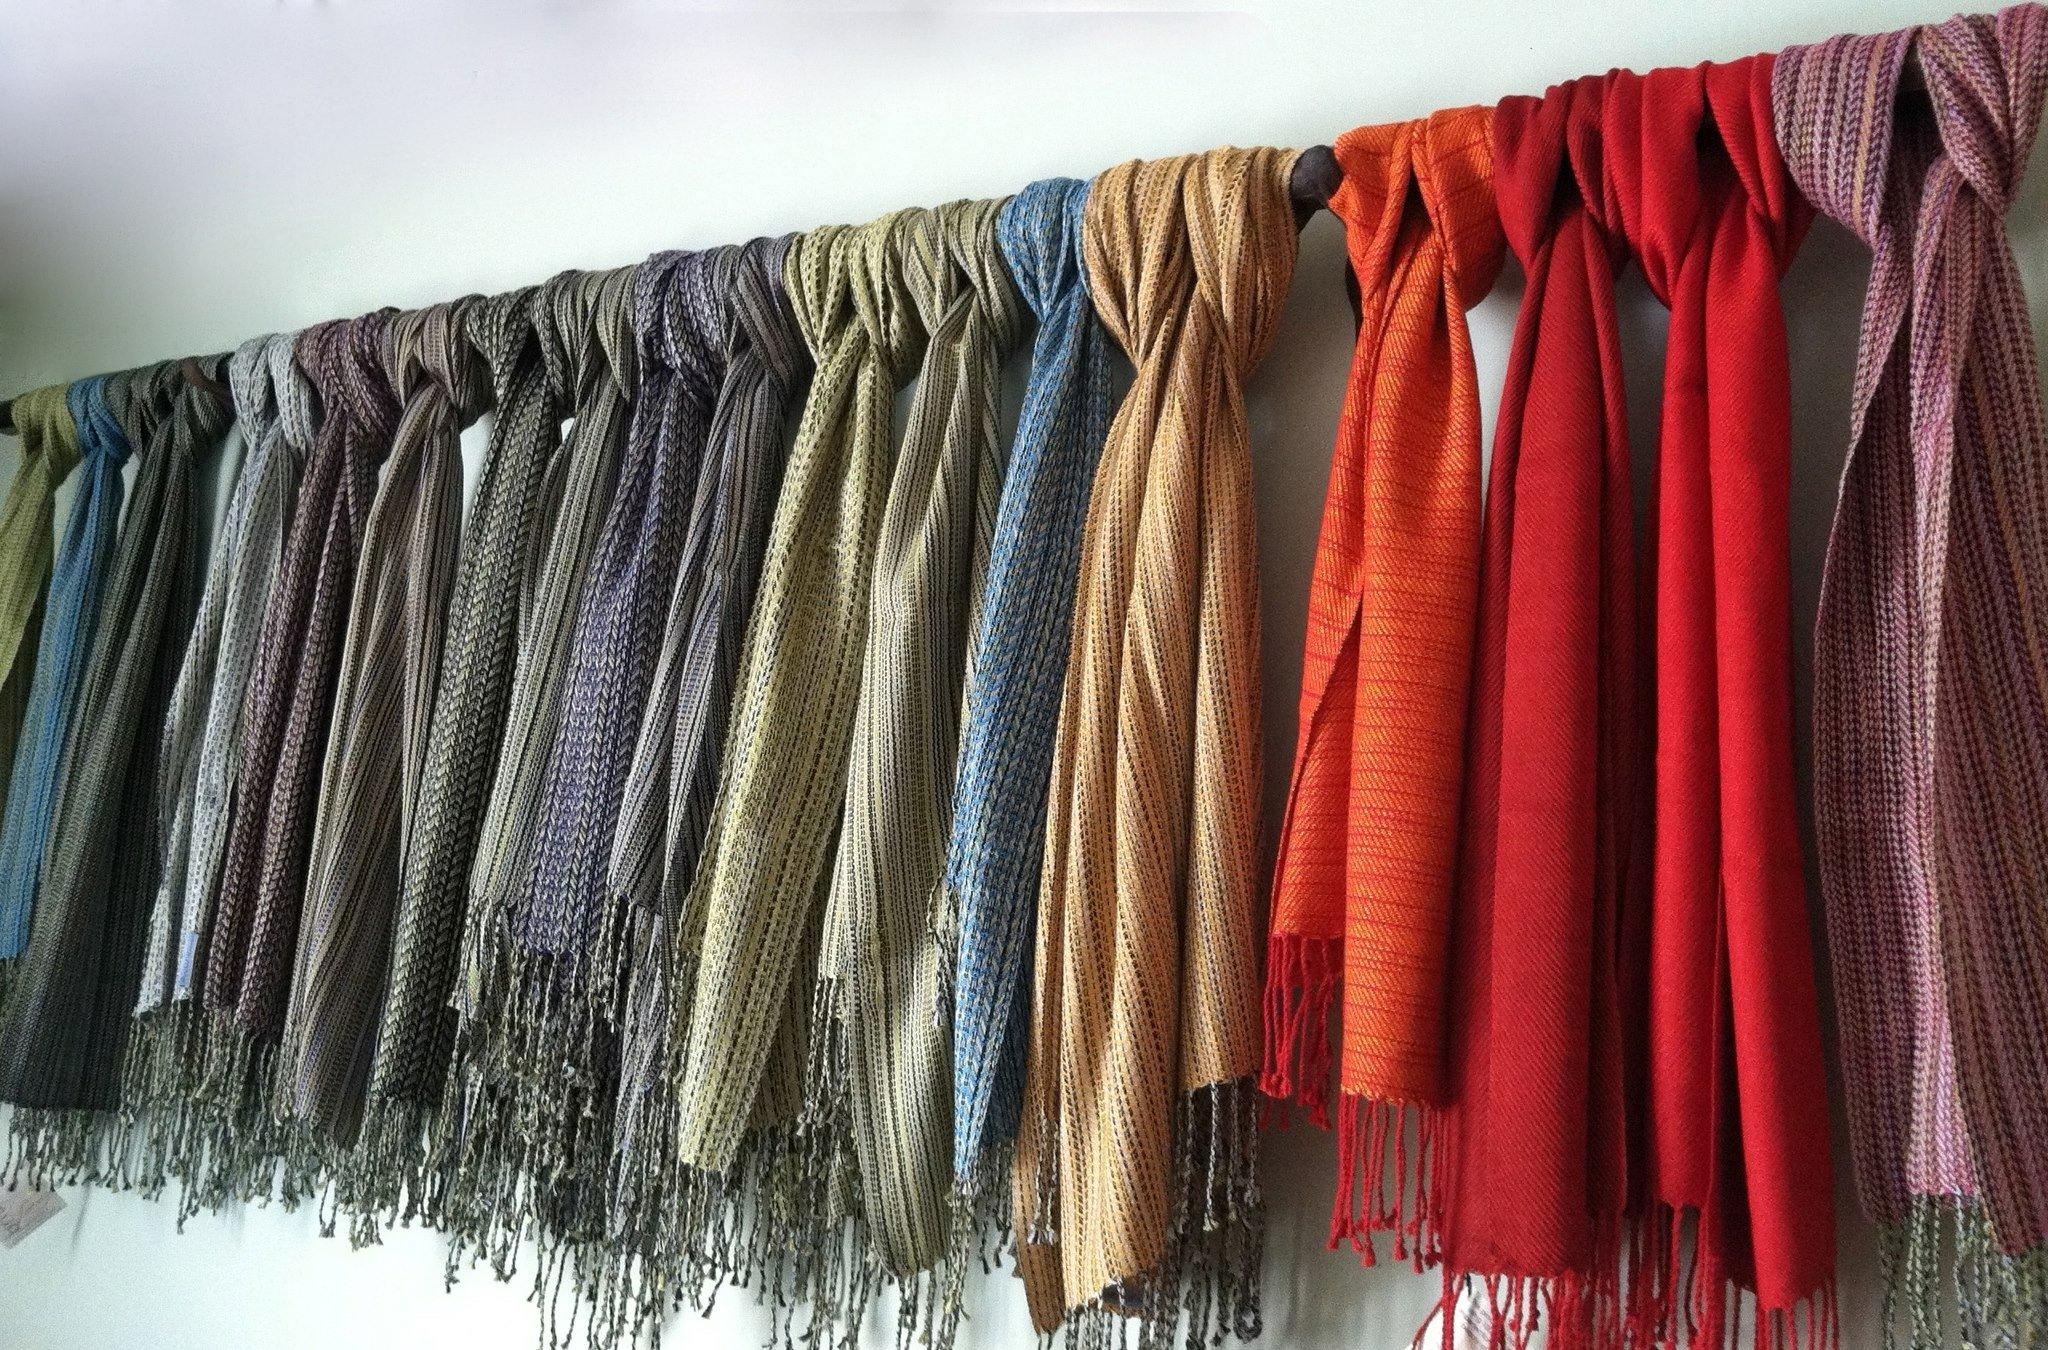 Bristol Looms knotted fabrics